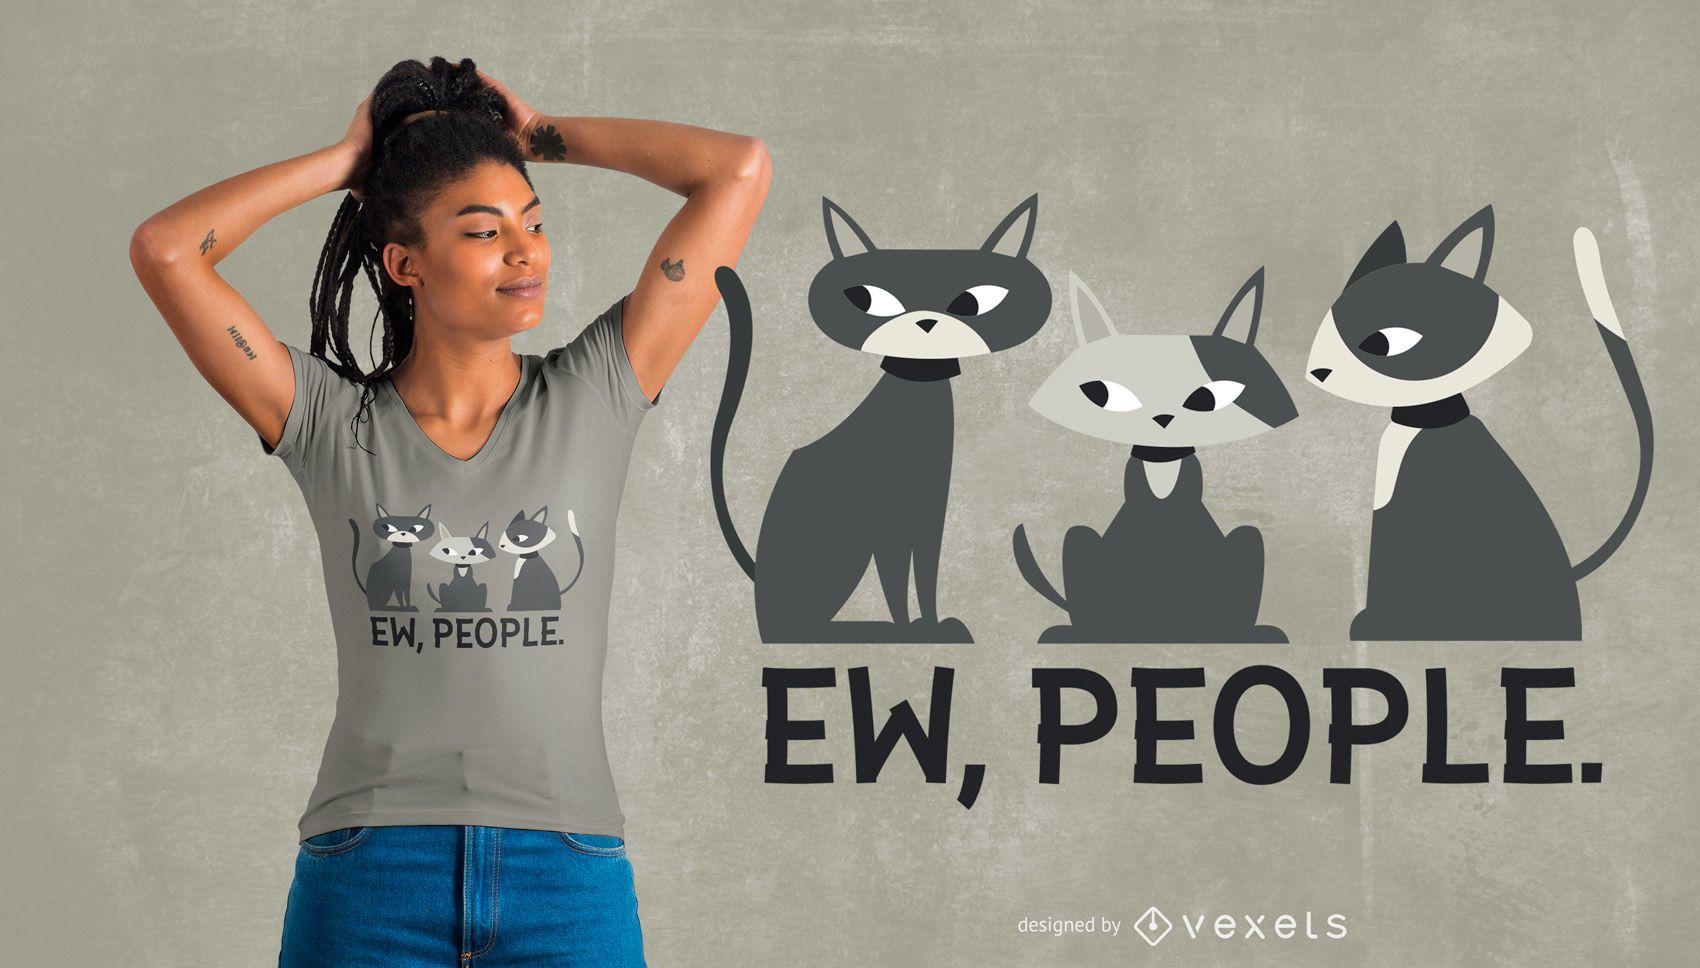 Ew diseño de camiseta de gatos de personas.